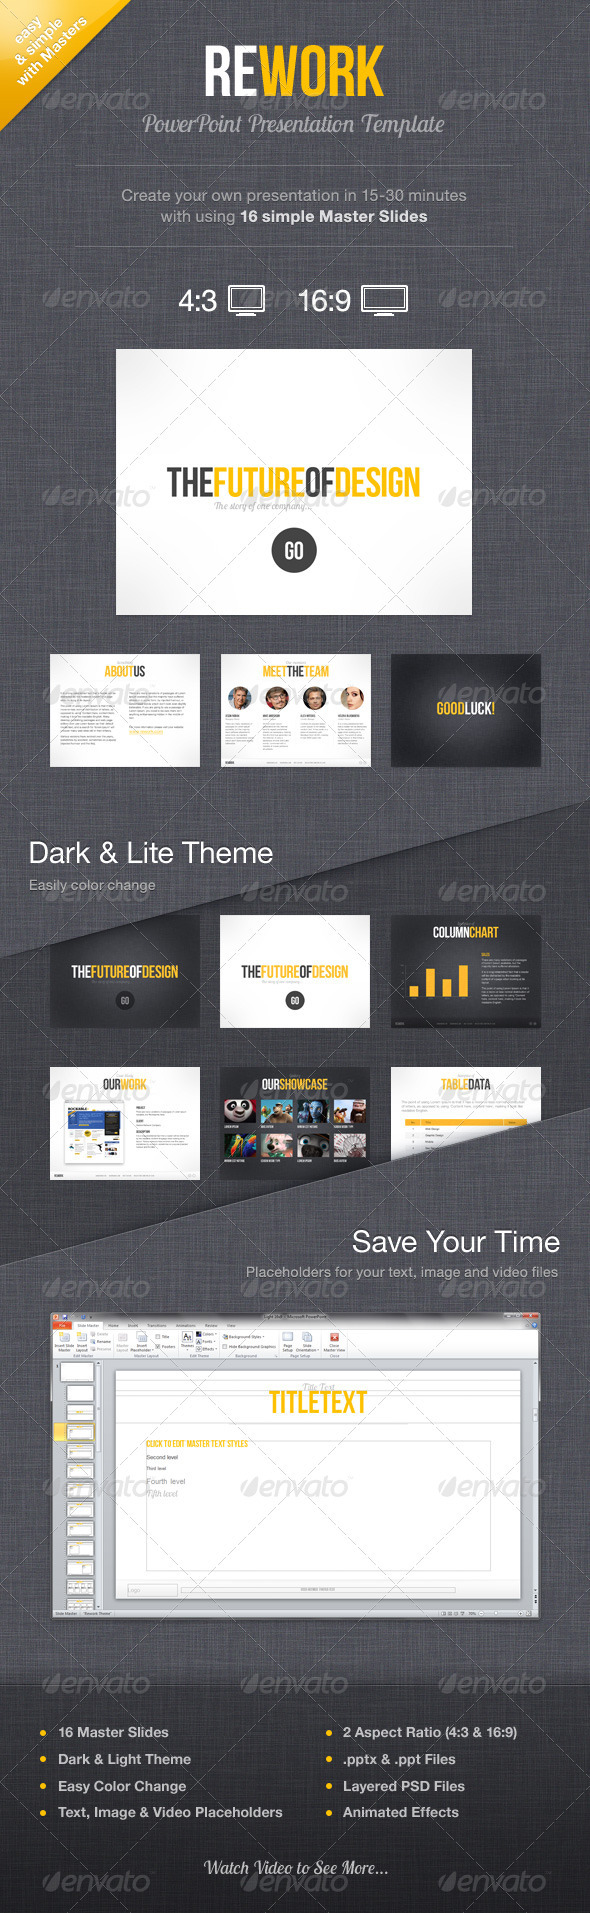 Rework powerpoint presentation template apresentao rework powerpoint presentation template toneelgroepblik Gallery